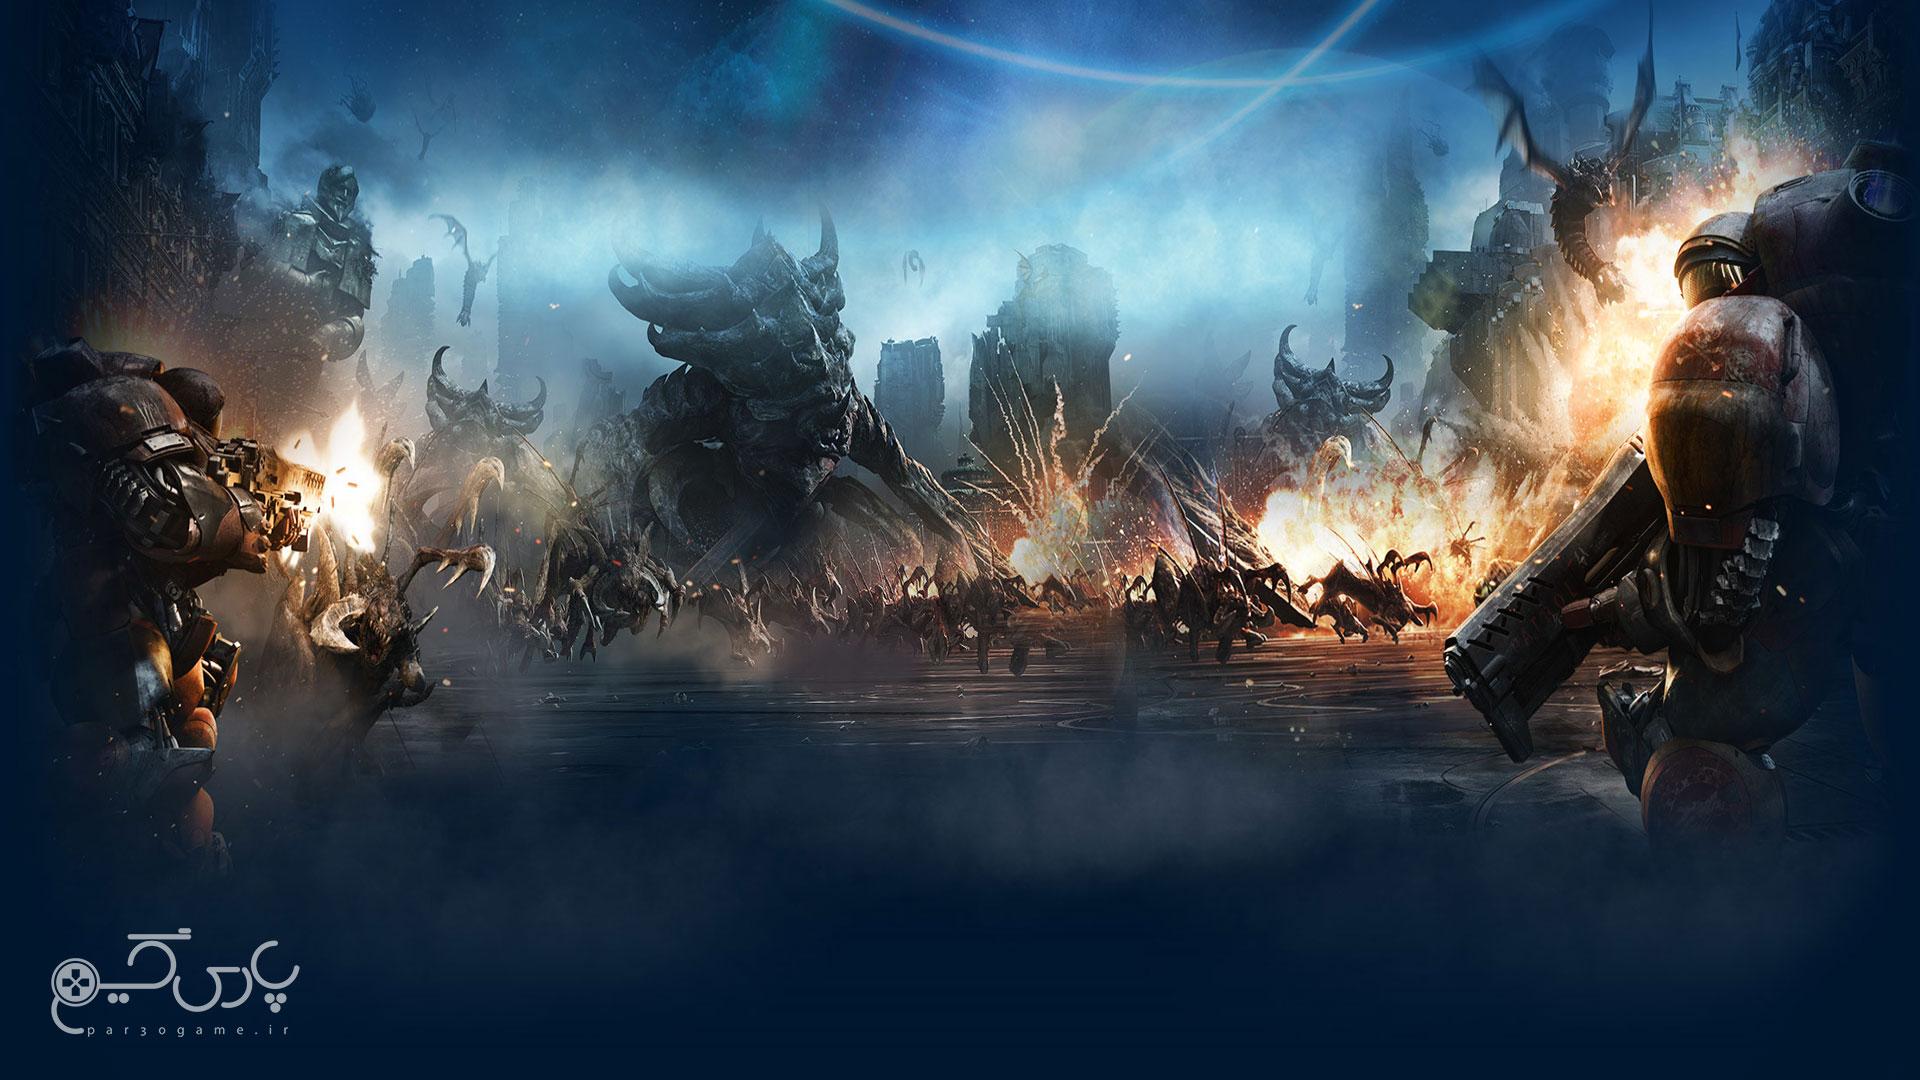 Amazon.com: StarCraft II: Wings of Liberty: Video Games